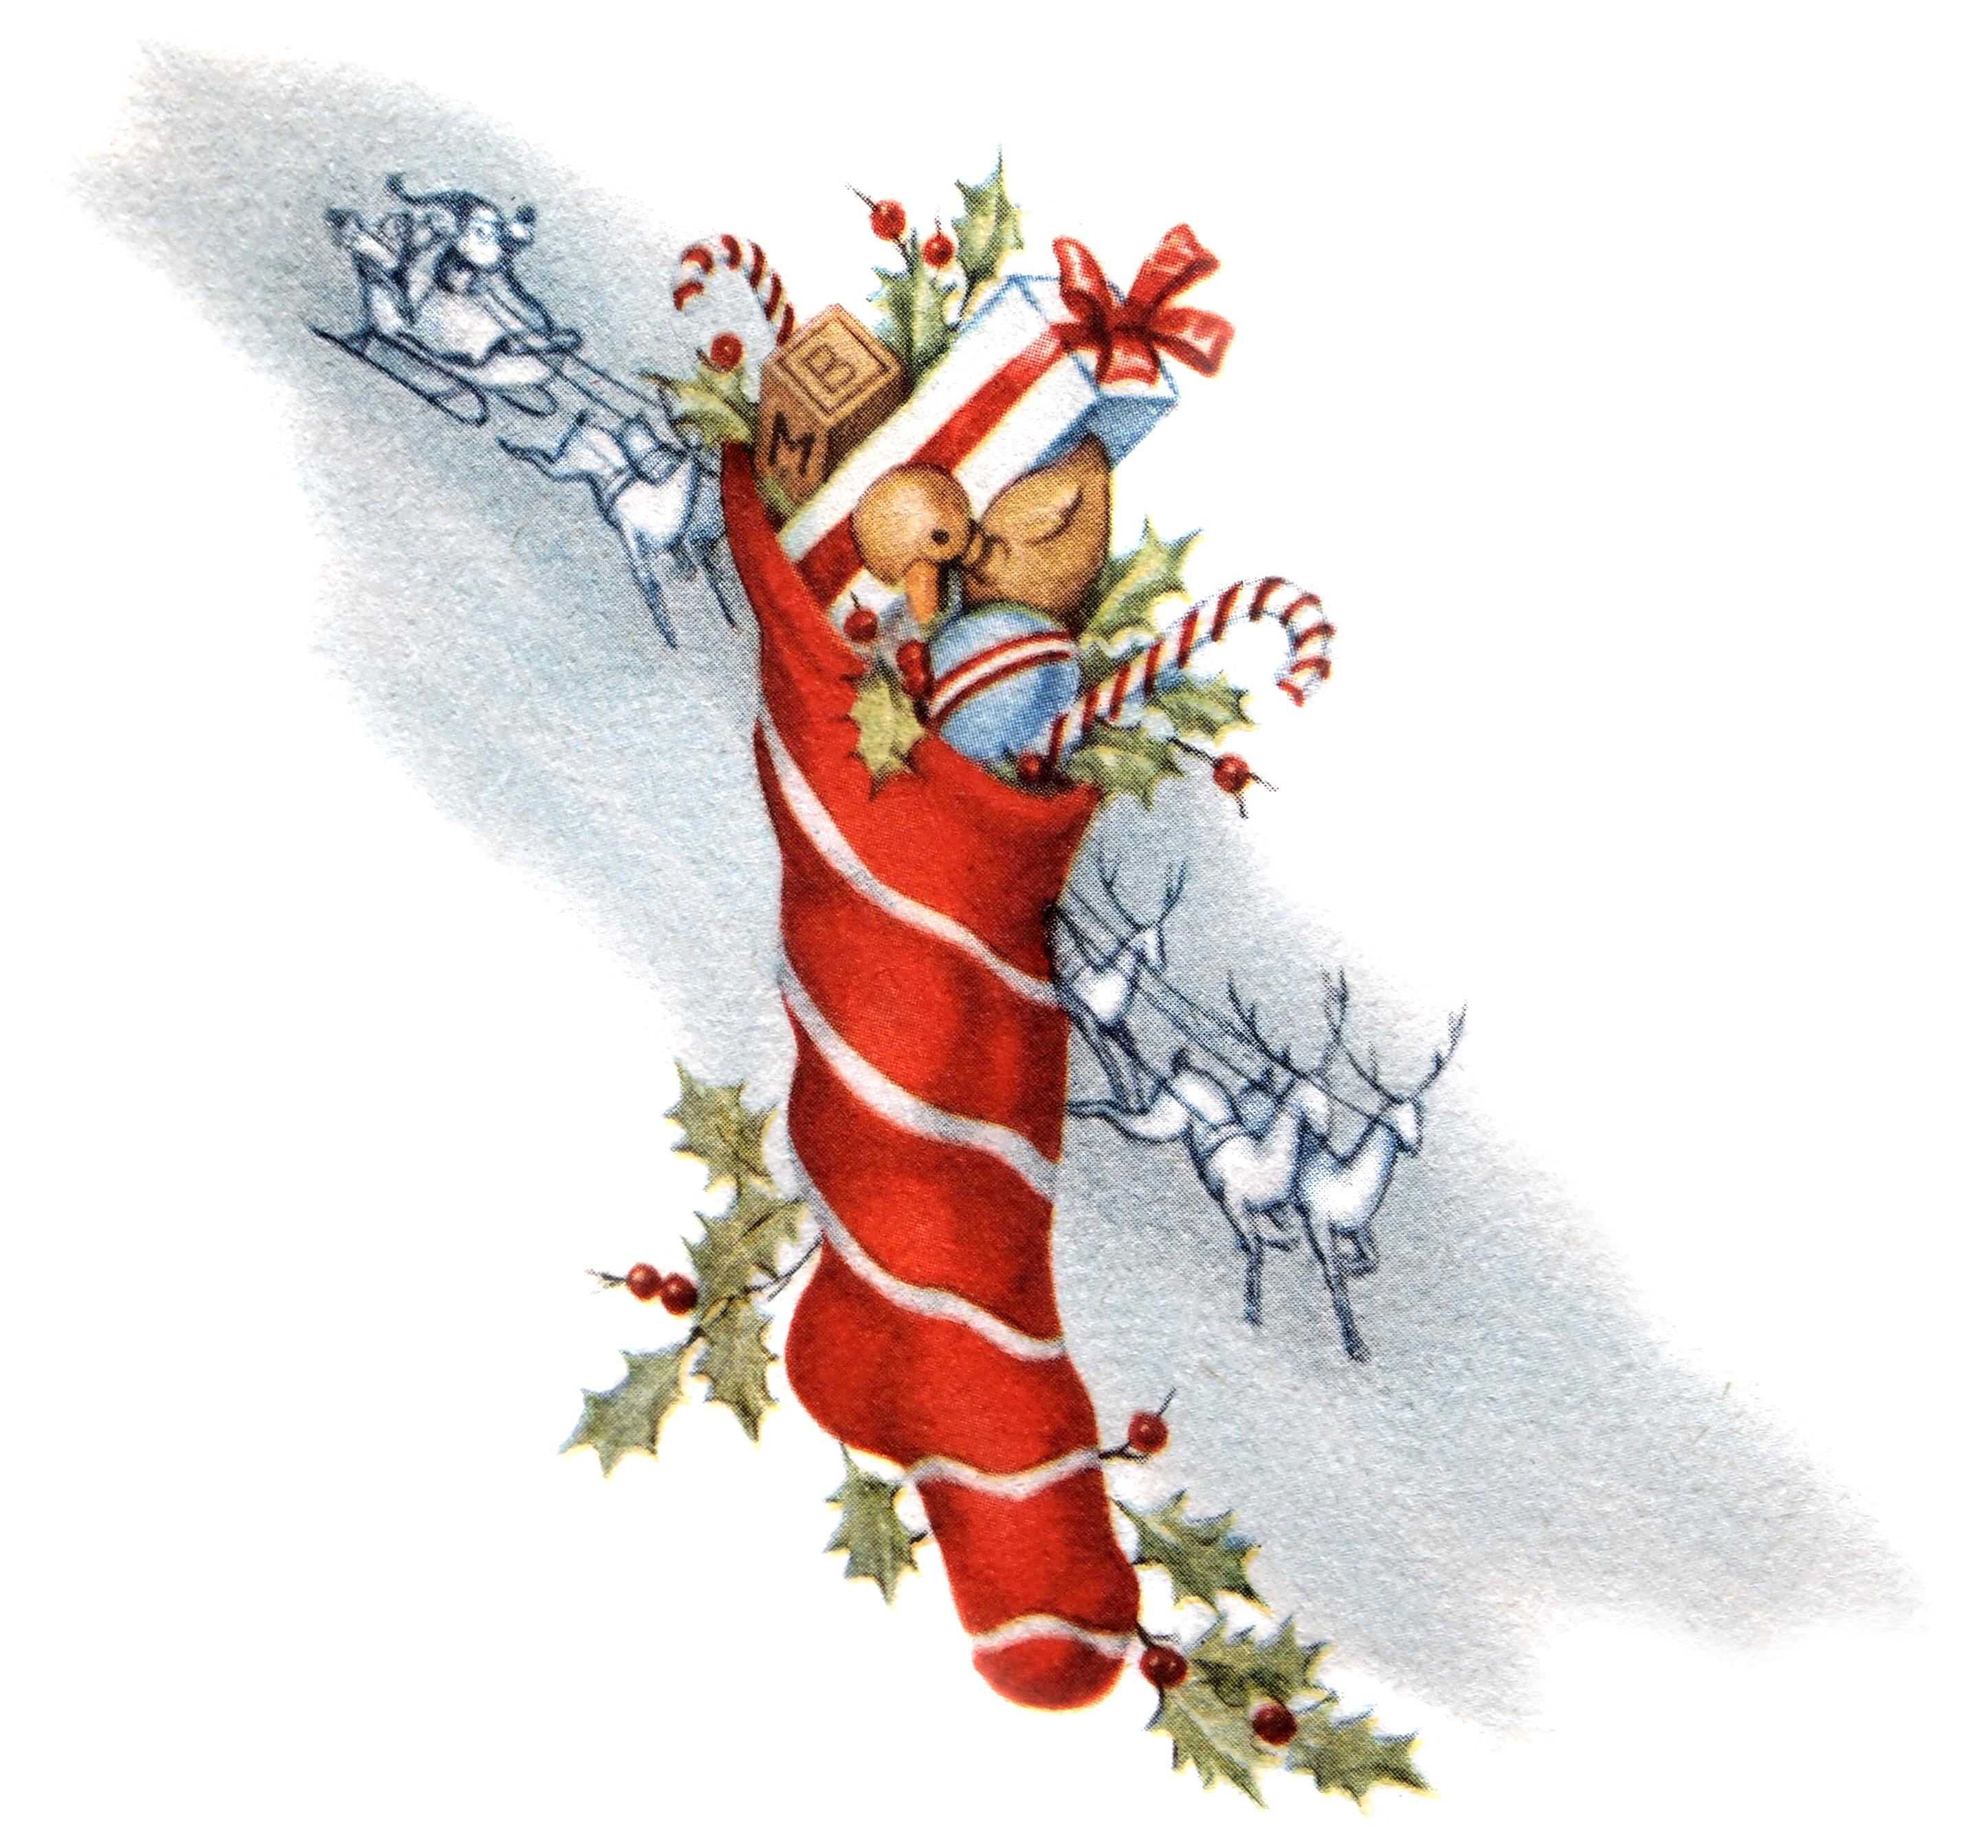 Vintage santa sleigh clipart png freeuse download Vintage Santa with Reindeer and Sleigh Clip Art @ Vintage ... png freeuse download